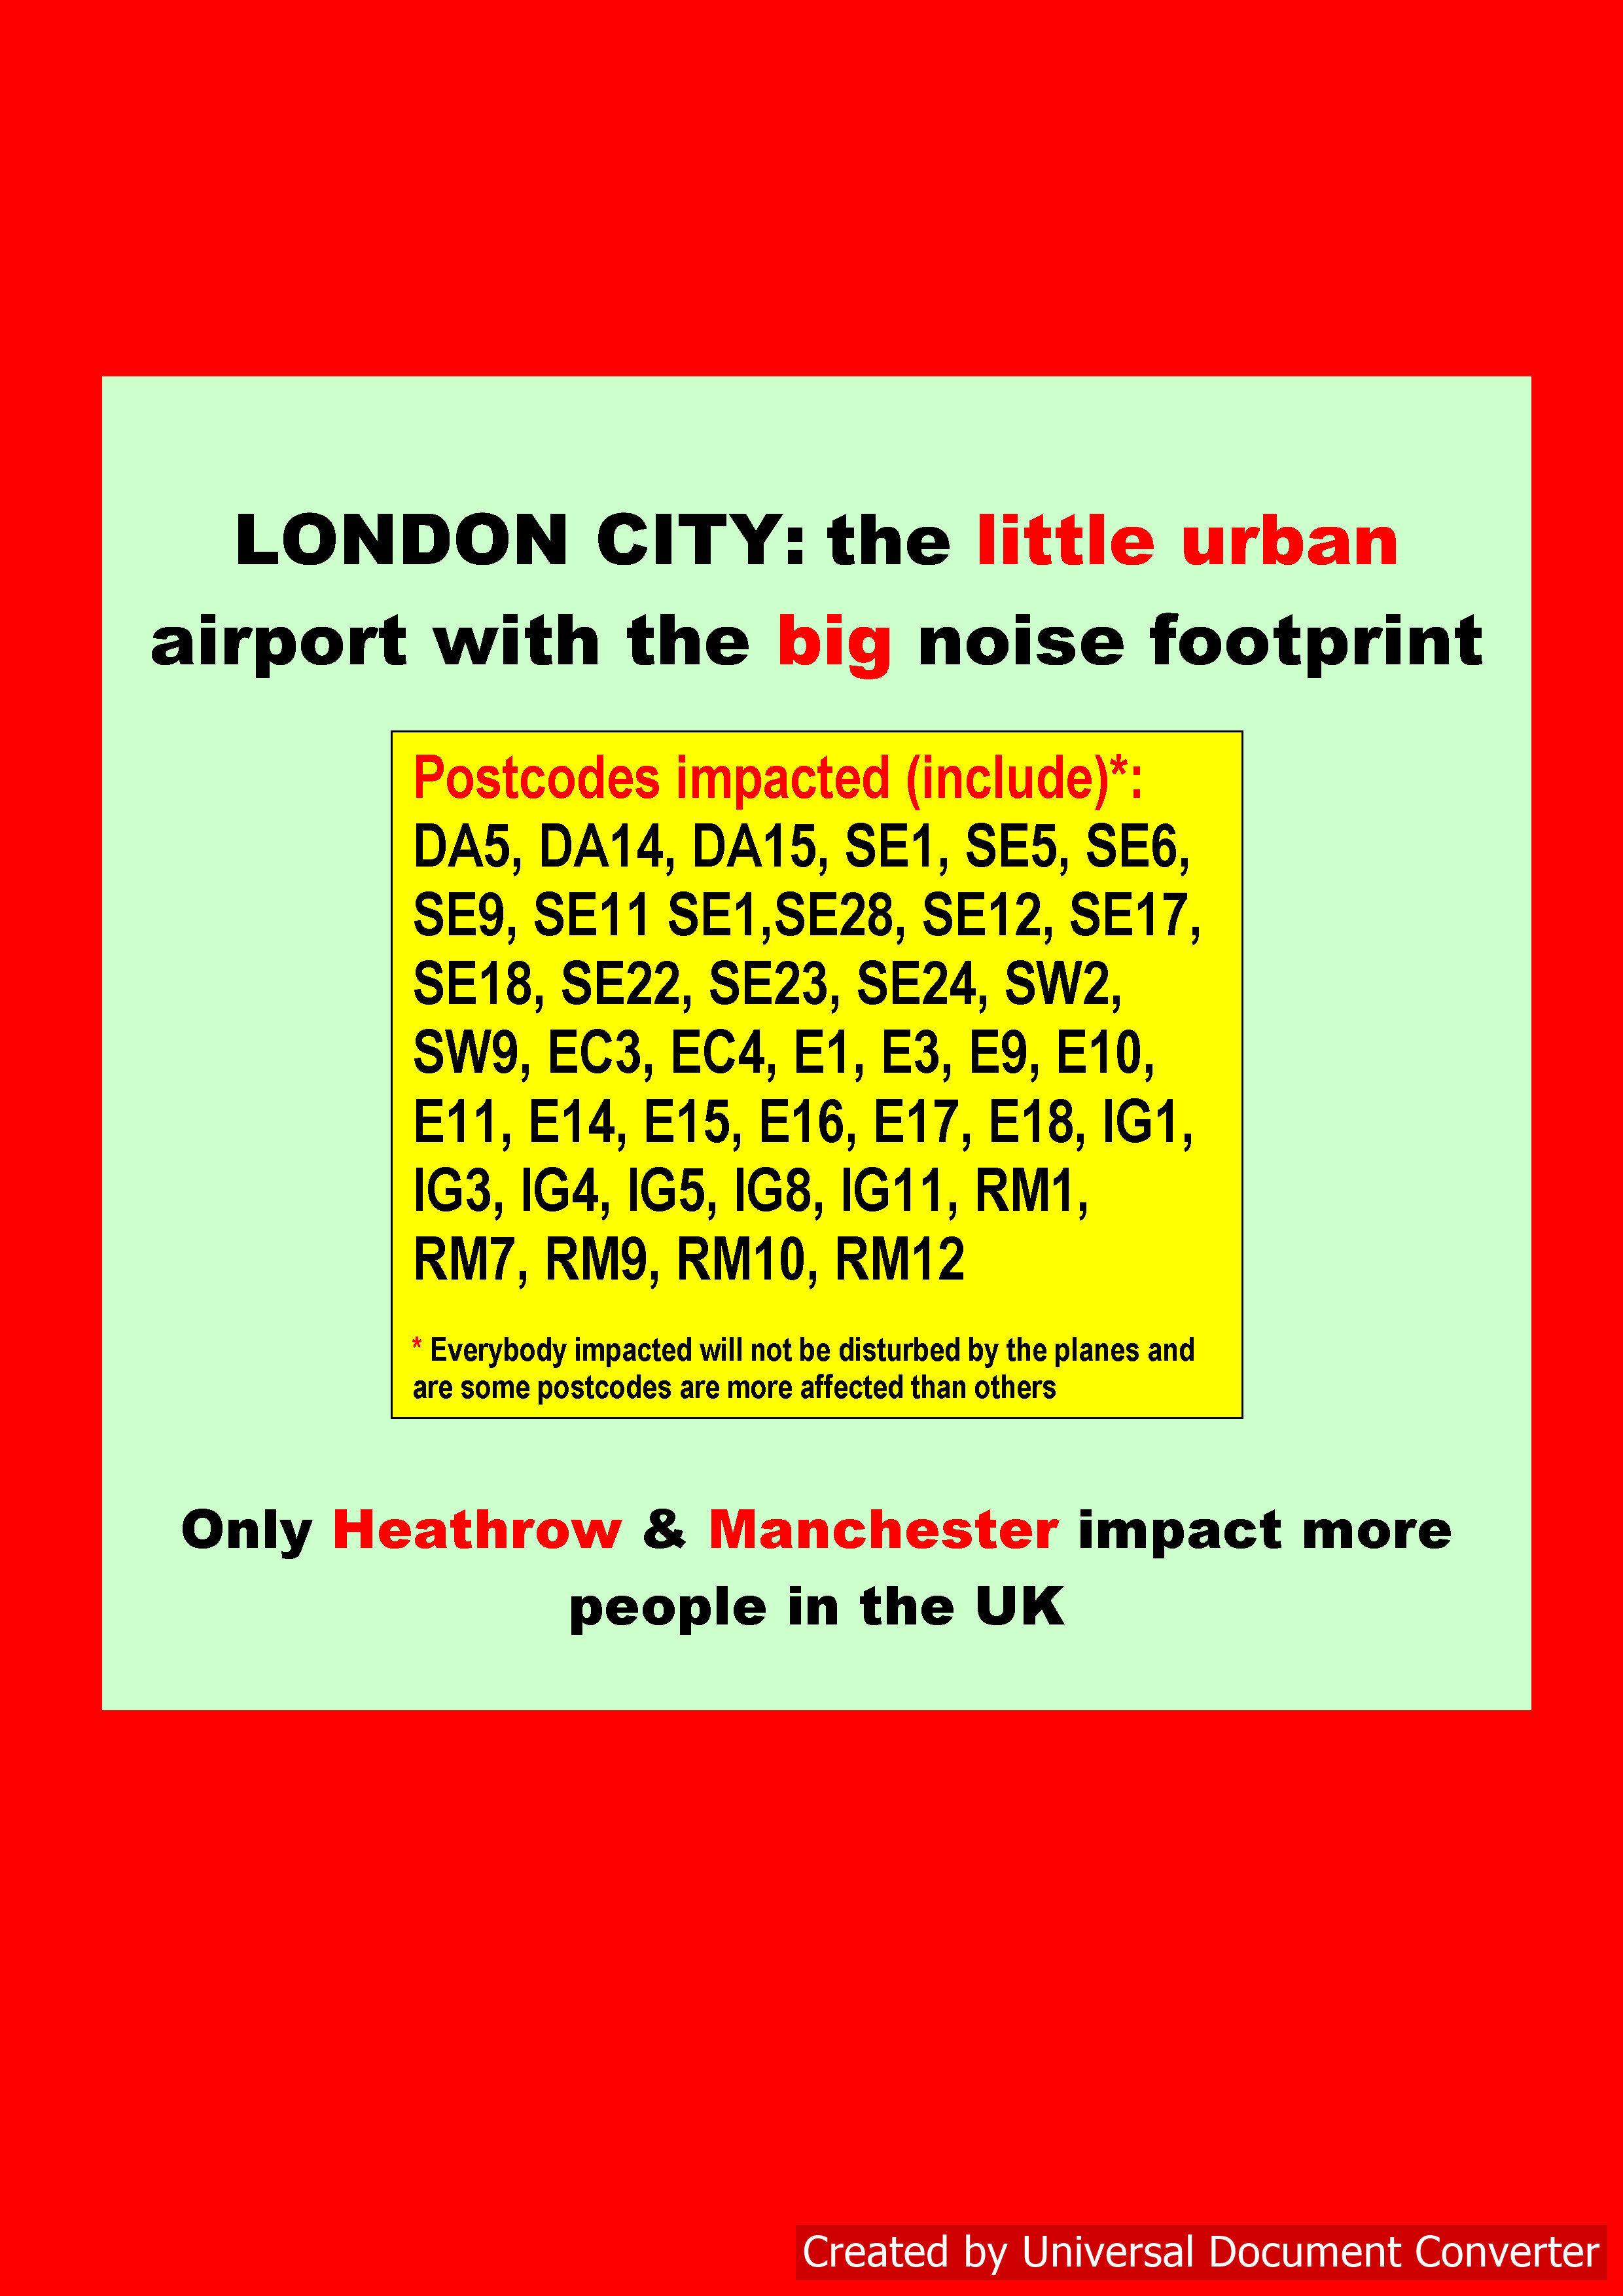 LONDON CITY footprint one.jpg